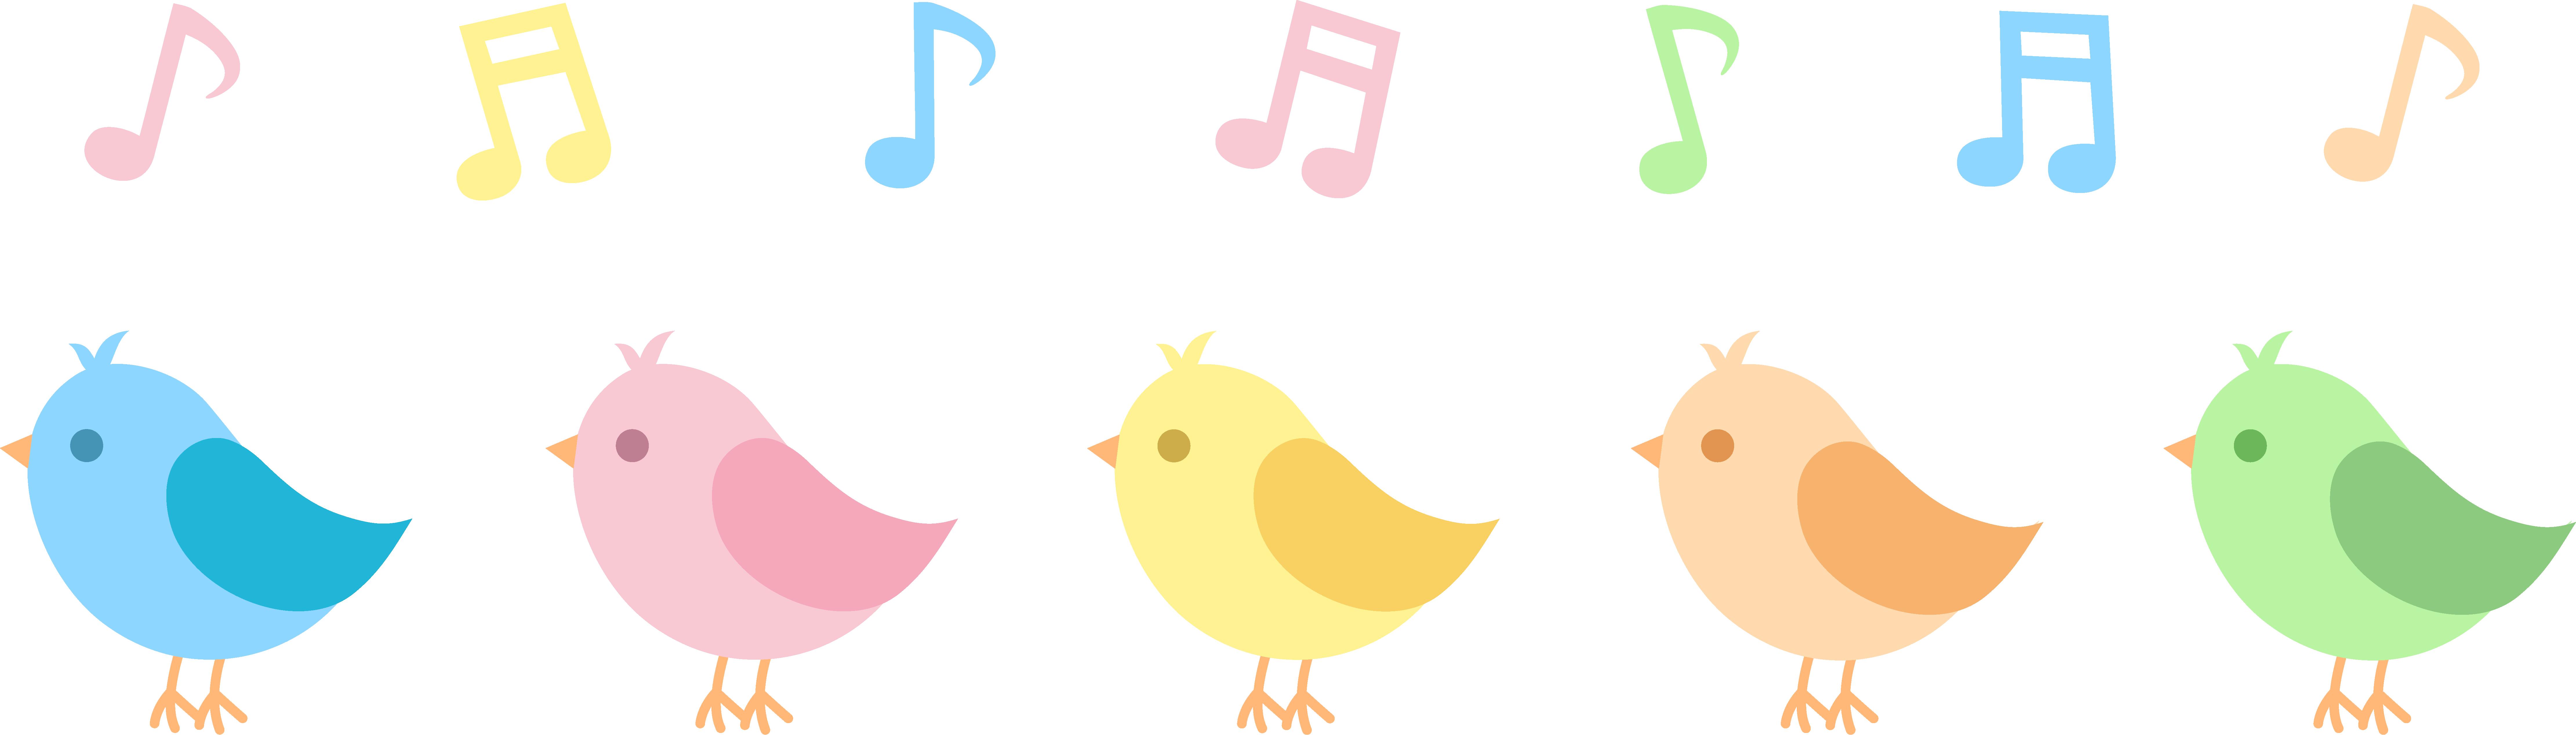 Future clipart option. Songbird cute bird pencil